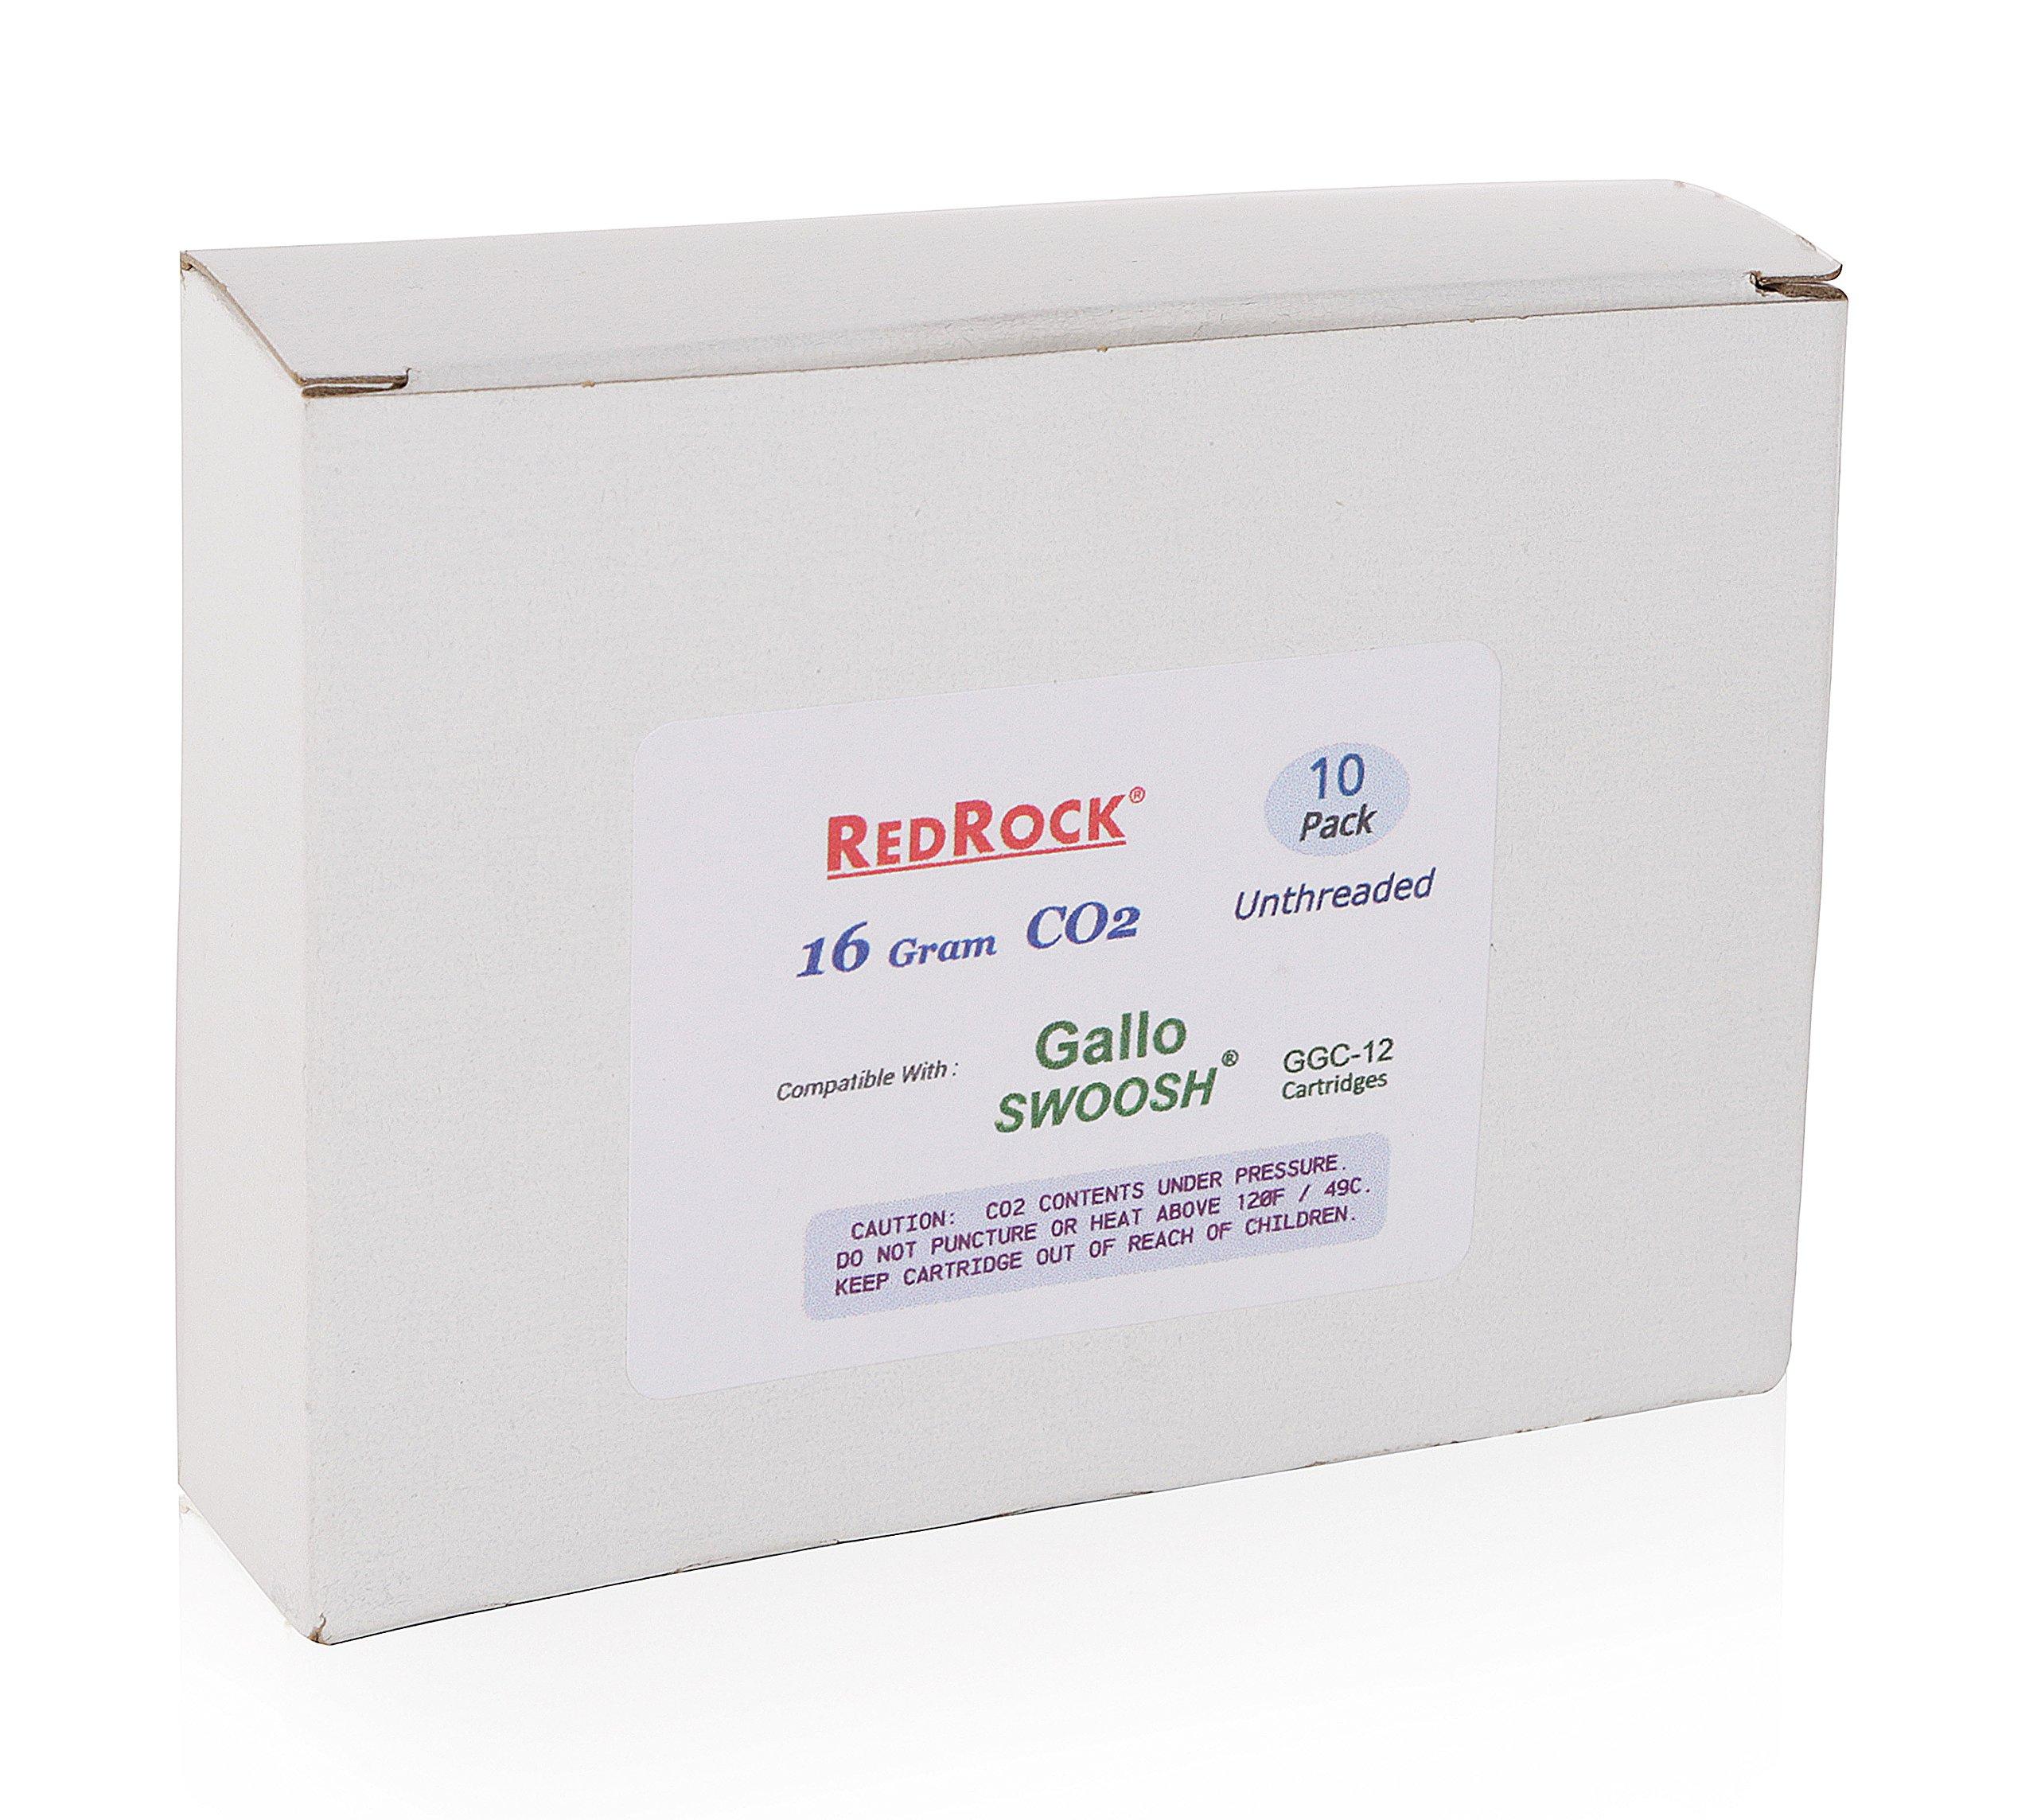 RedRock 16 Gram CO2 Gallo Swoosh Gun Cartridges - 10 Pack by RedRock